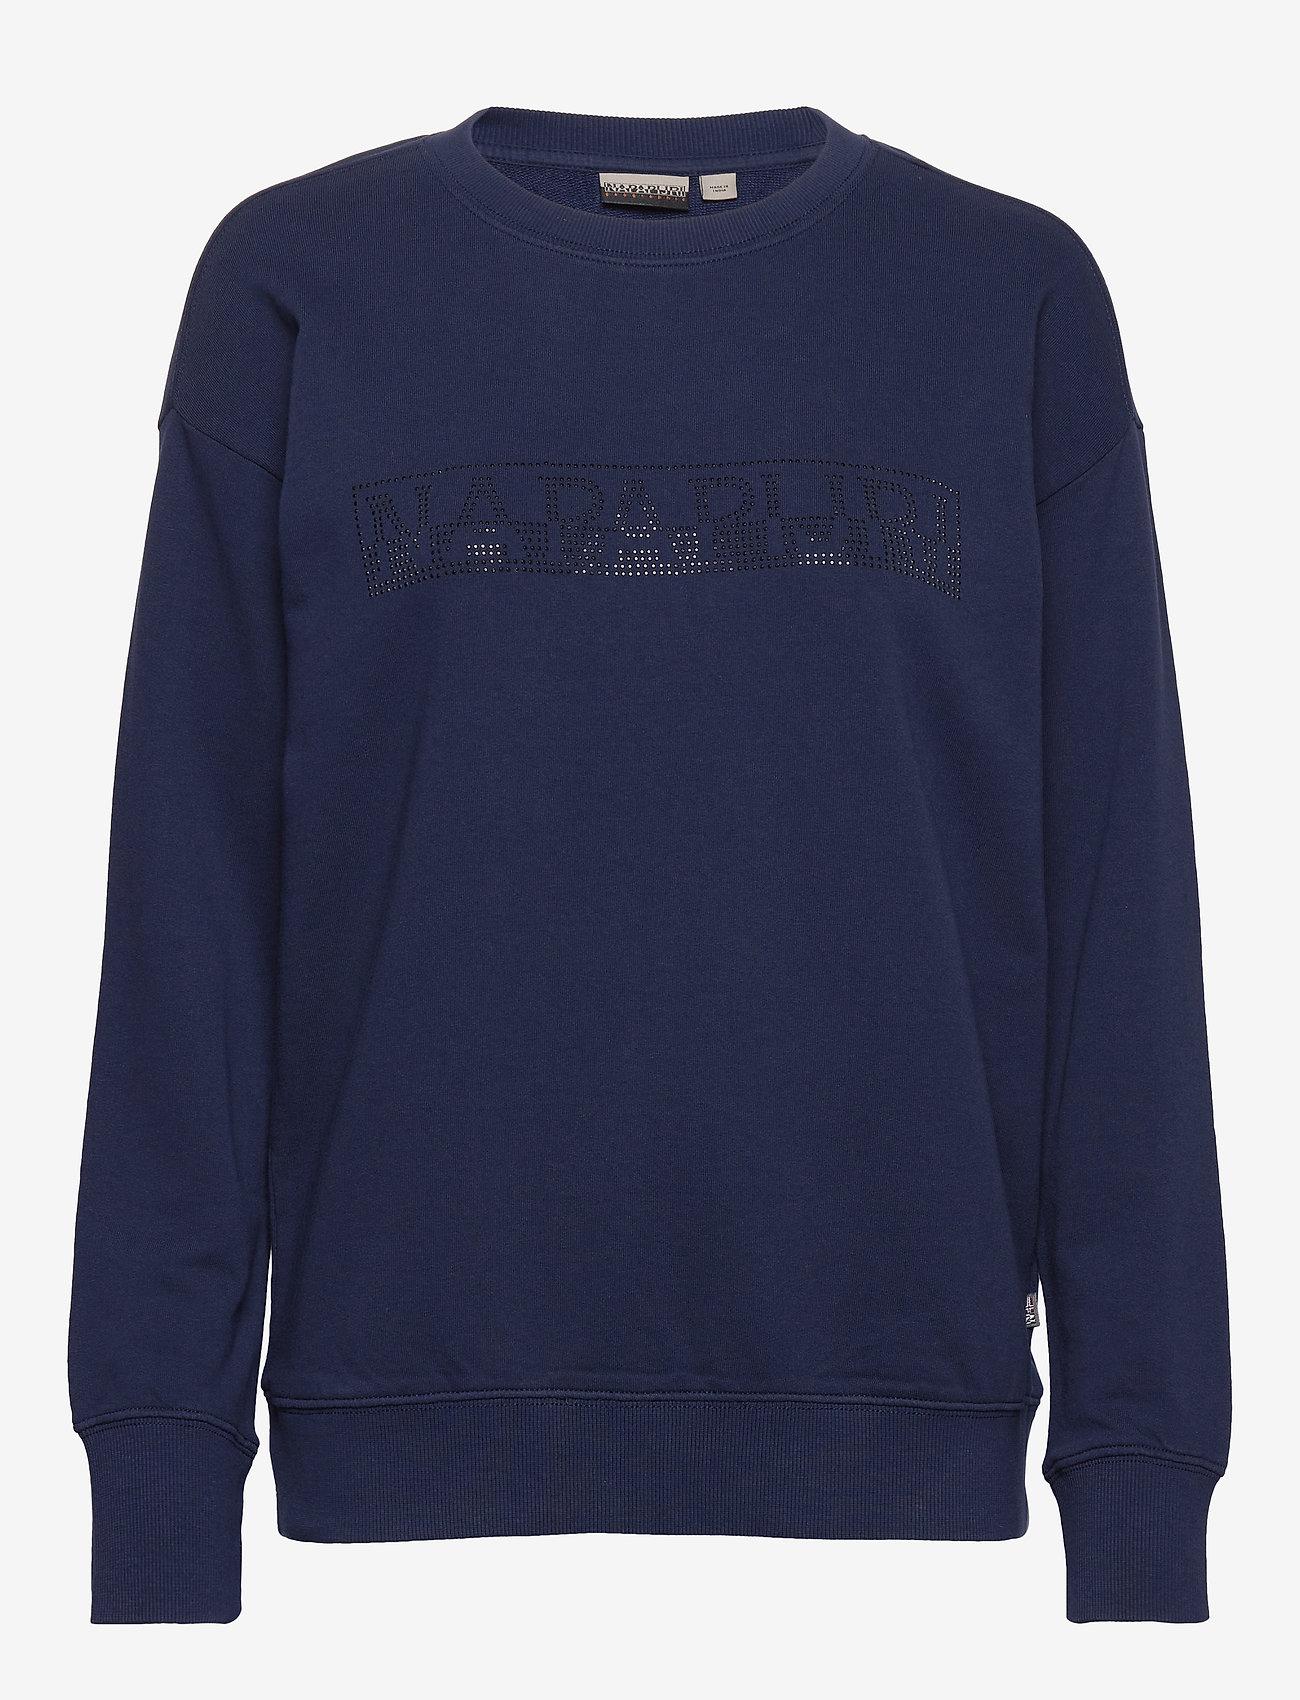 Napapijri - BICCARI C - sweaters - medieval blue - 0